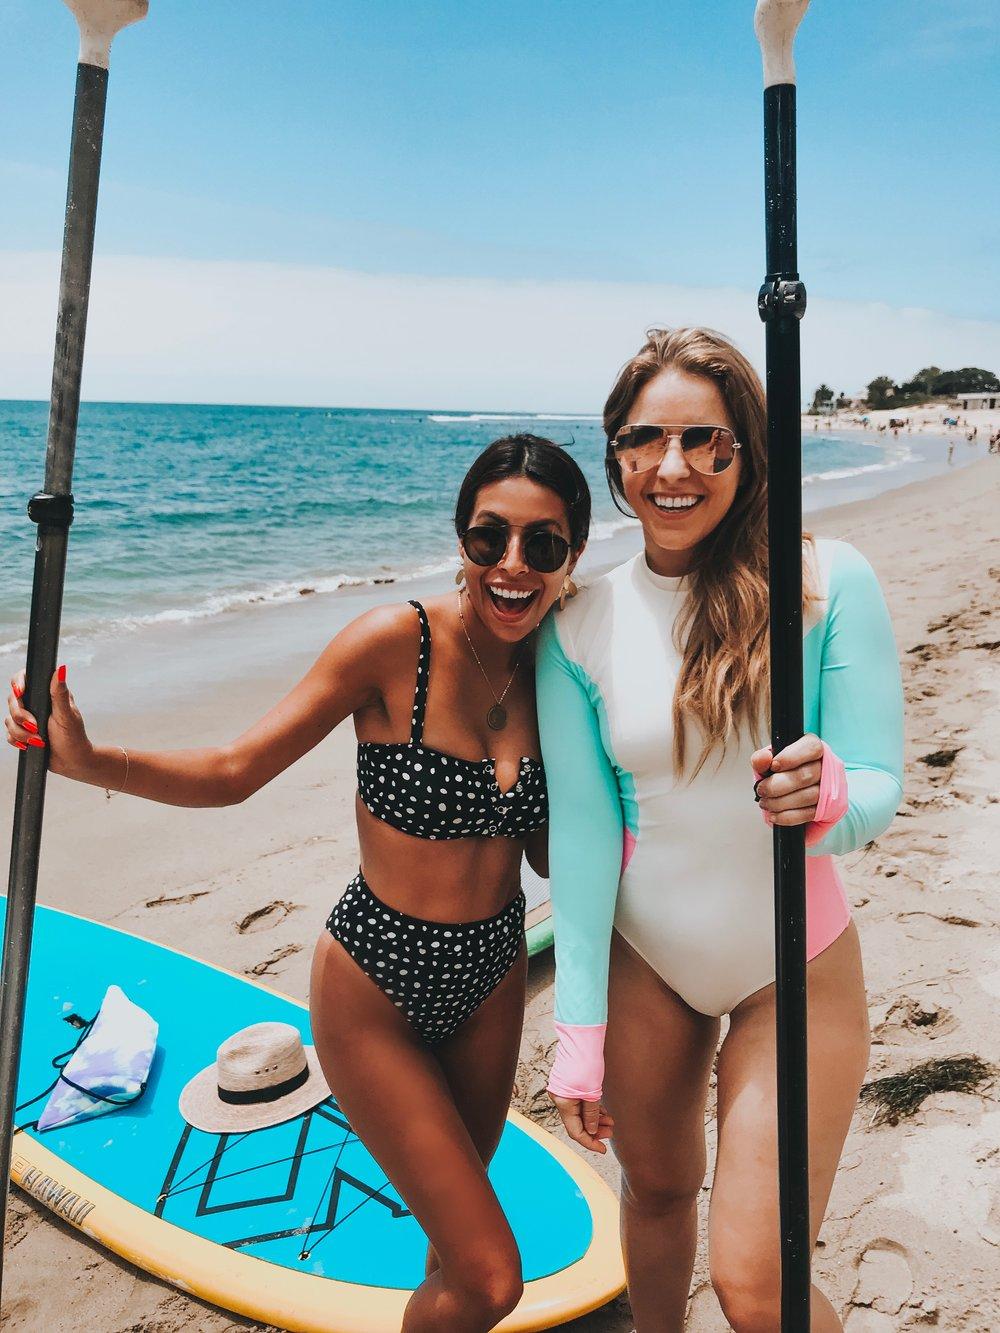 Malibu Pier Paddle Boarding - What to do in Malibu